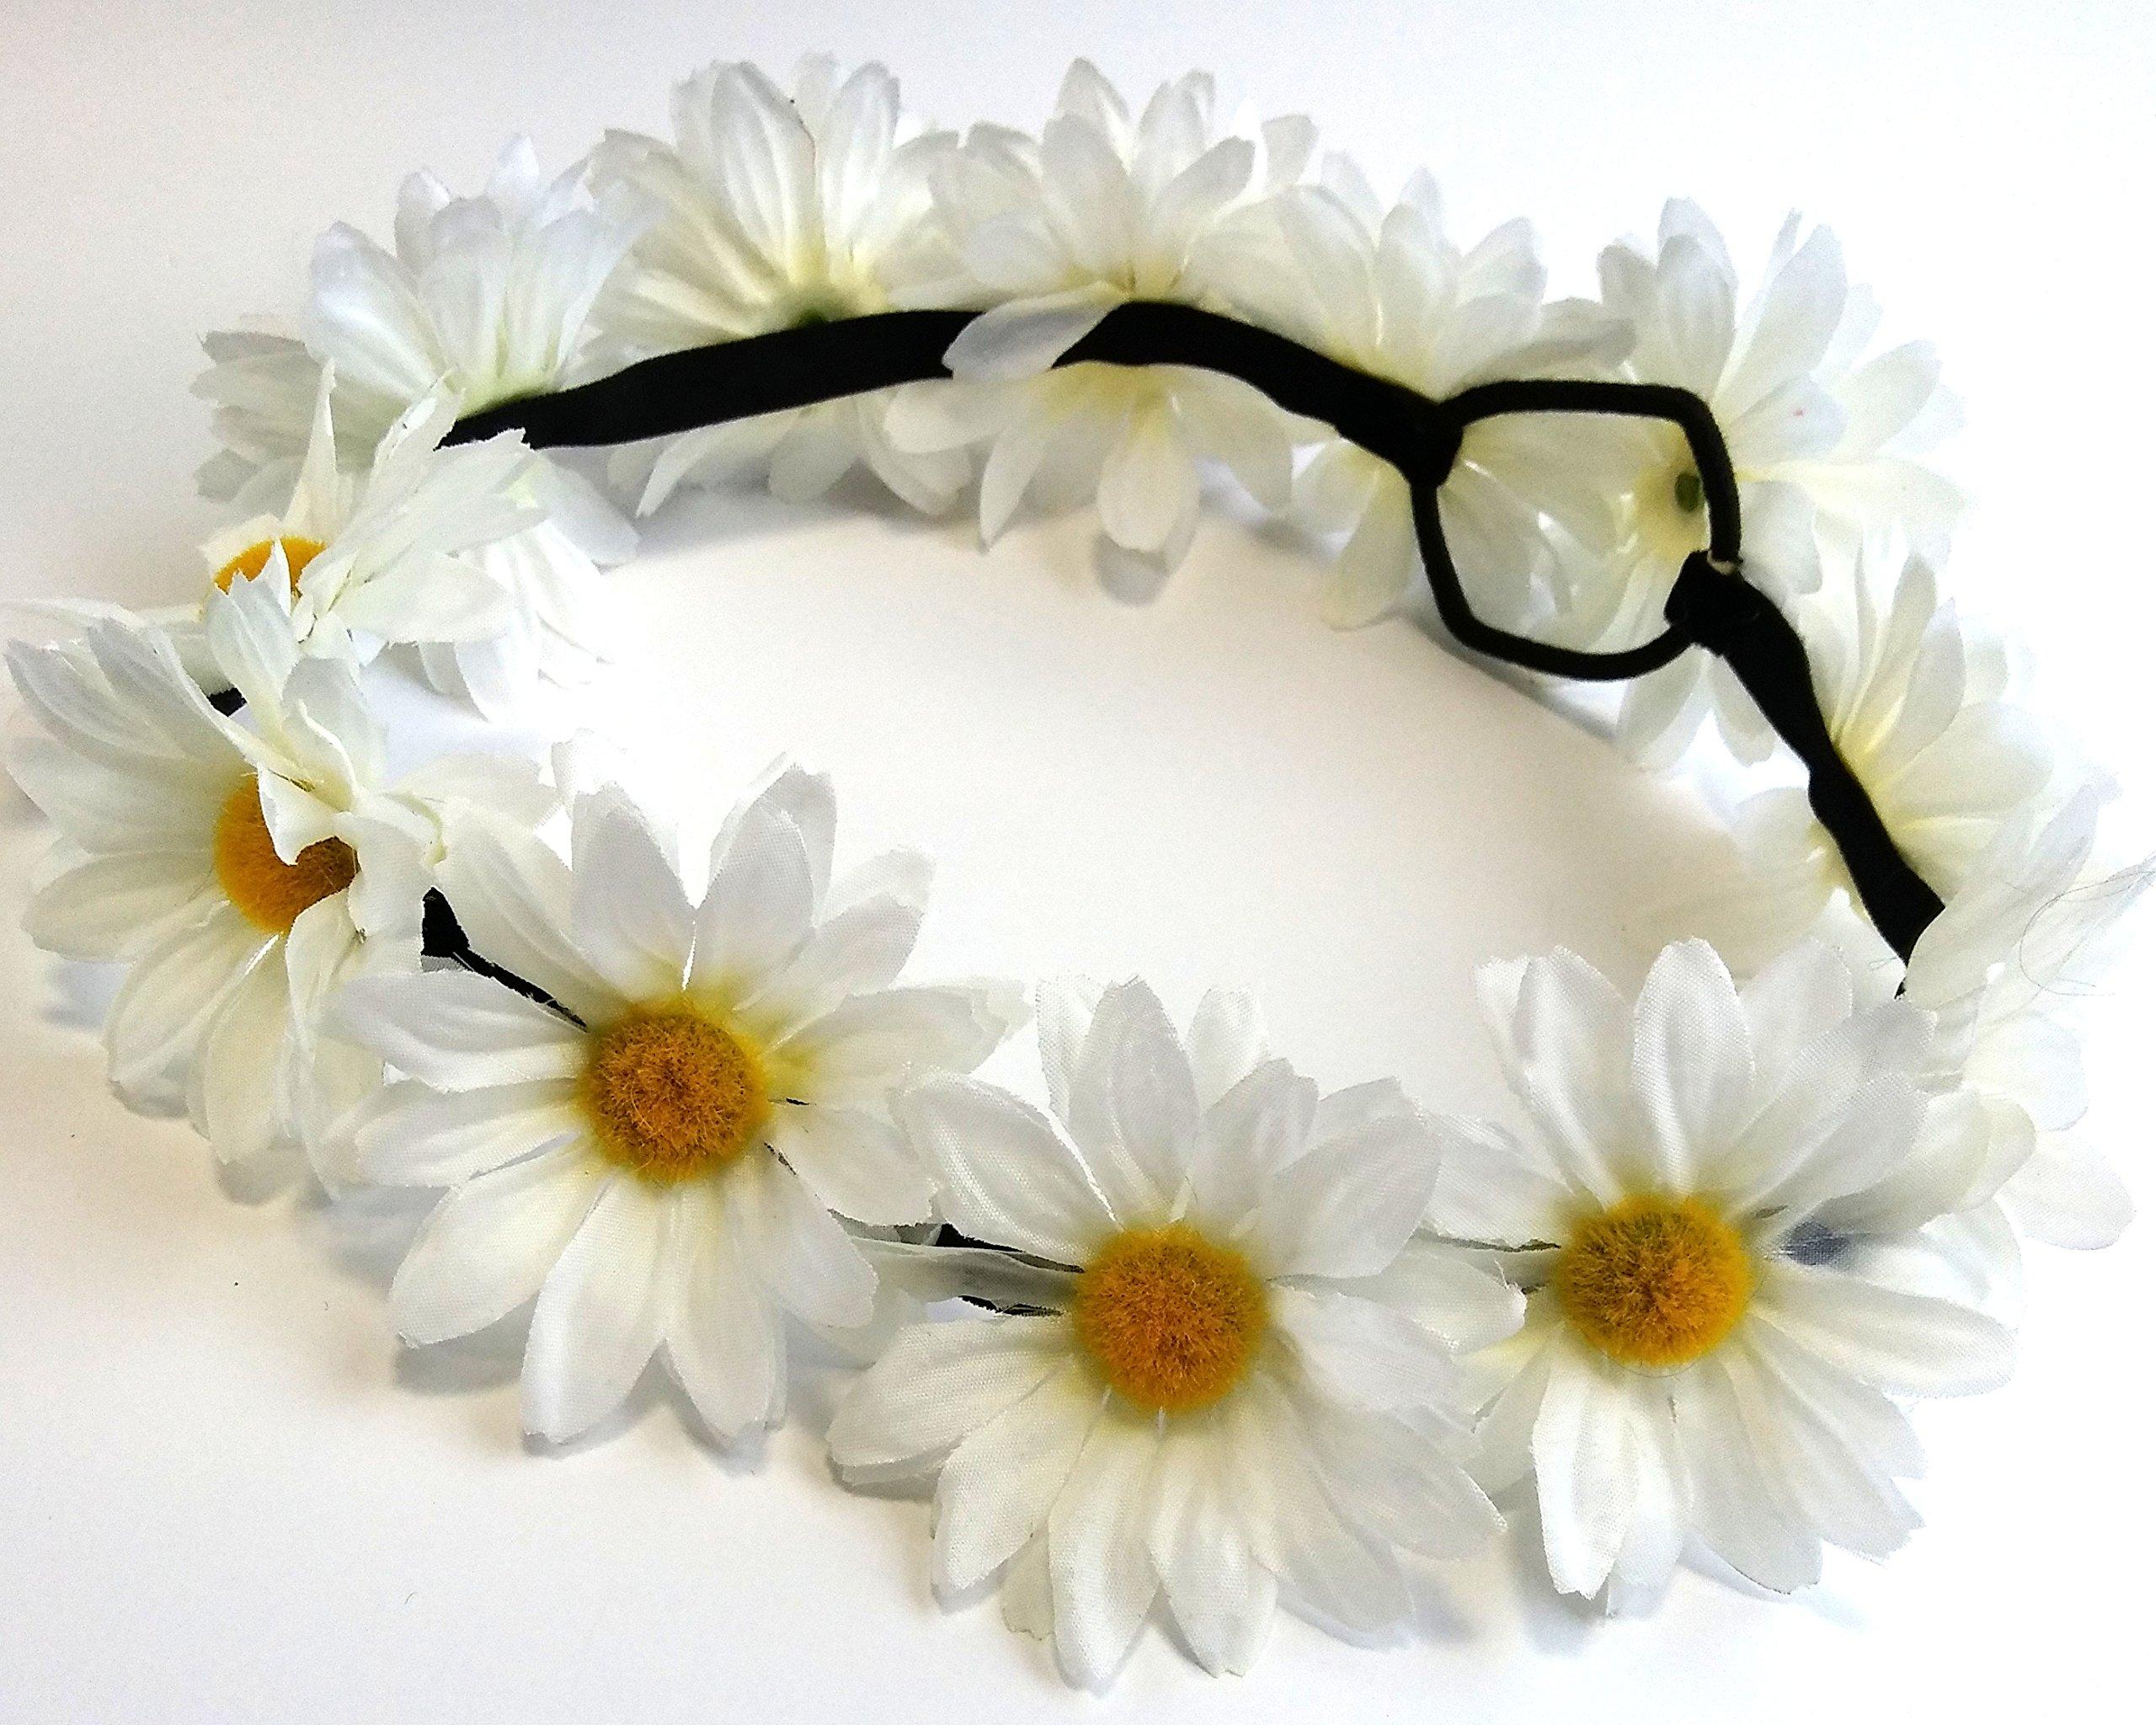 Cheap Daisy Chain Headband Find Daisy Chain Headband Deals On Line